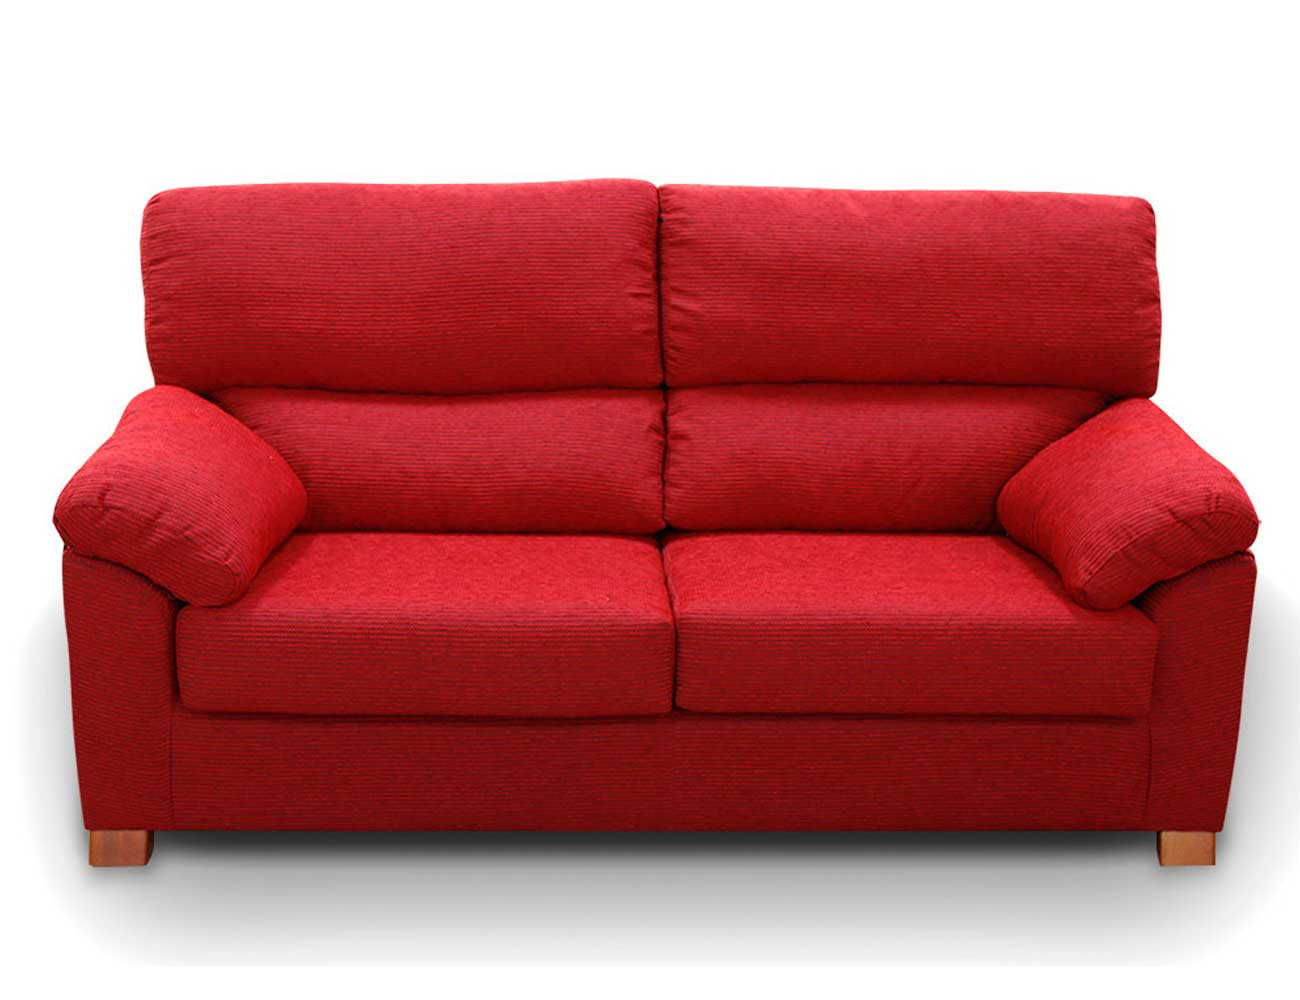 Sof cama con sistema extraible 7020 factory del for Sofa 4 plazas barato